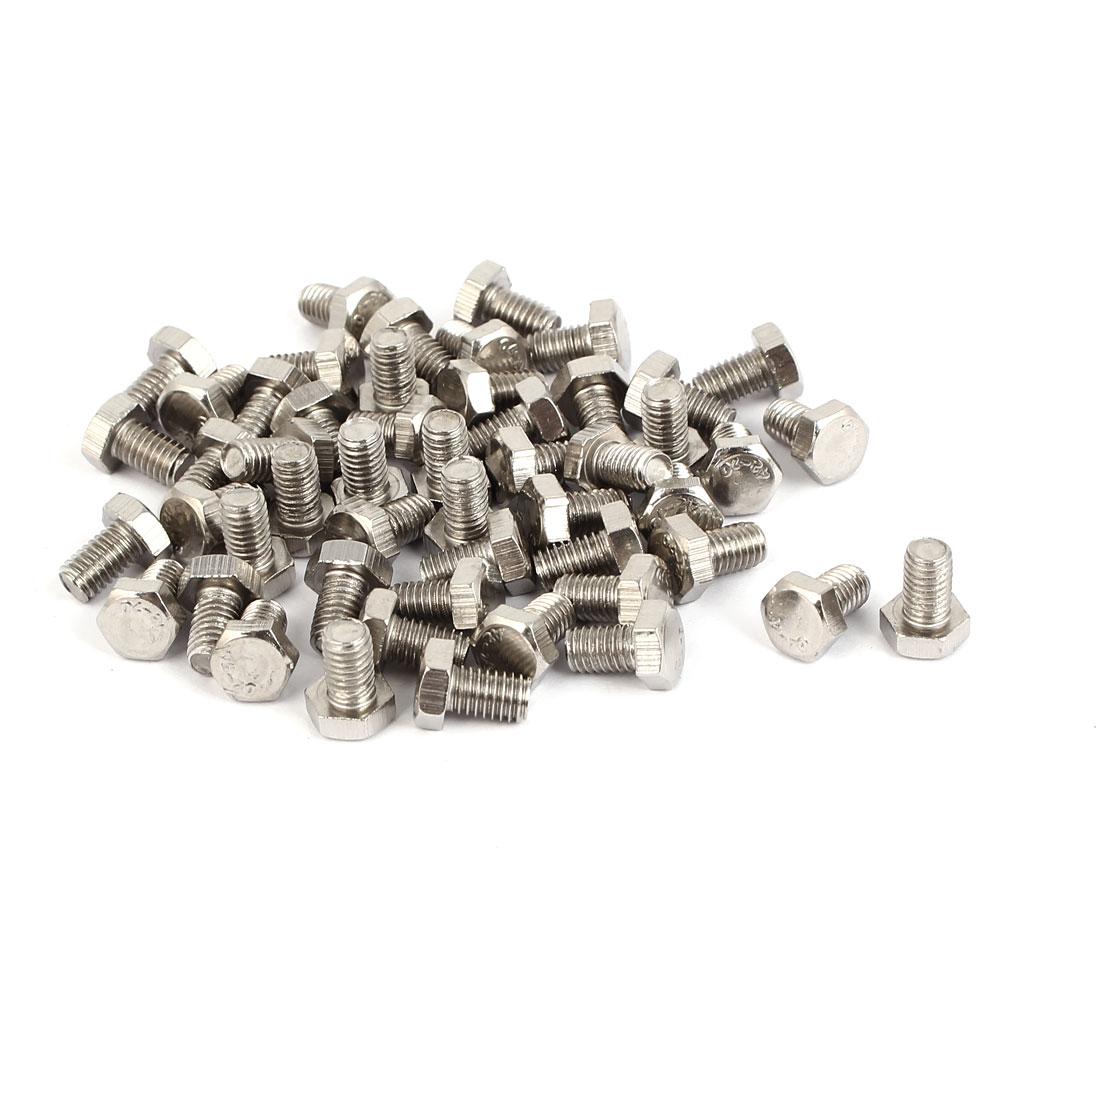 M5 x 8mm Stainless Steel Fully Thread Hex Hexagon Screws Bolts DIN 933 50PCS